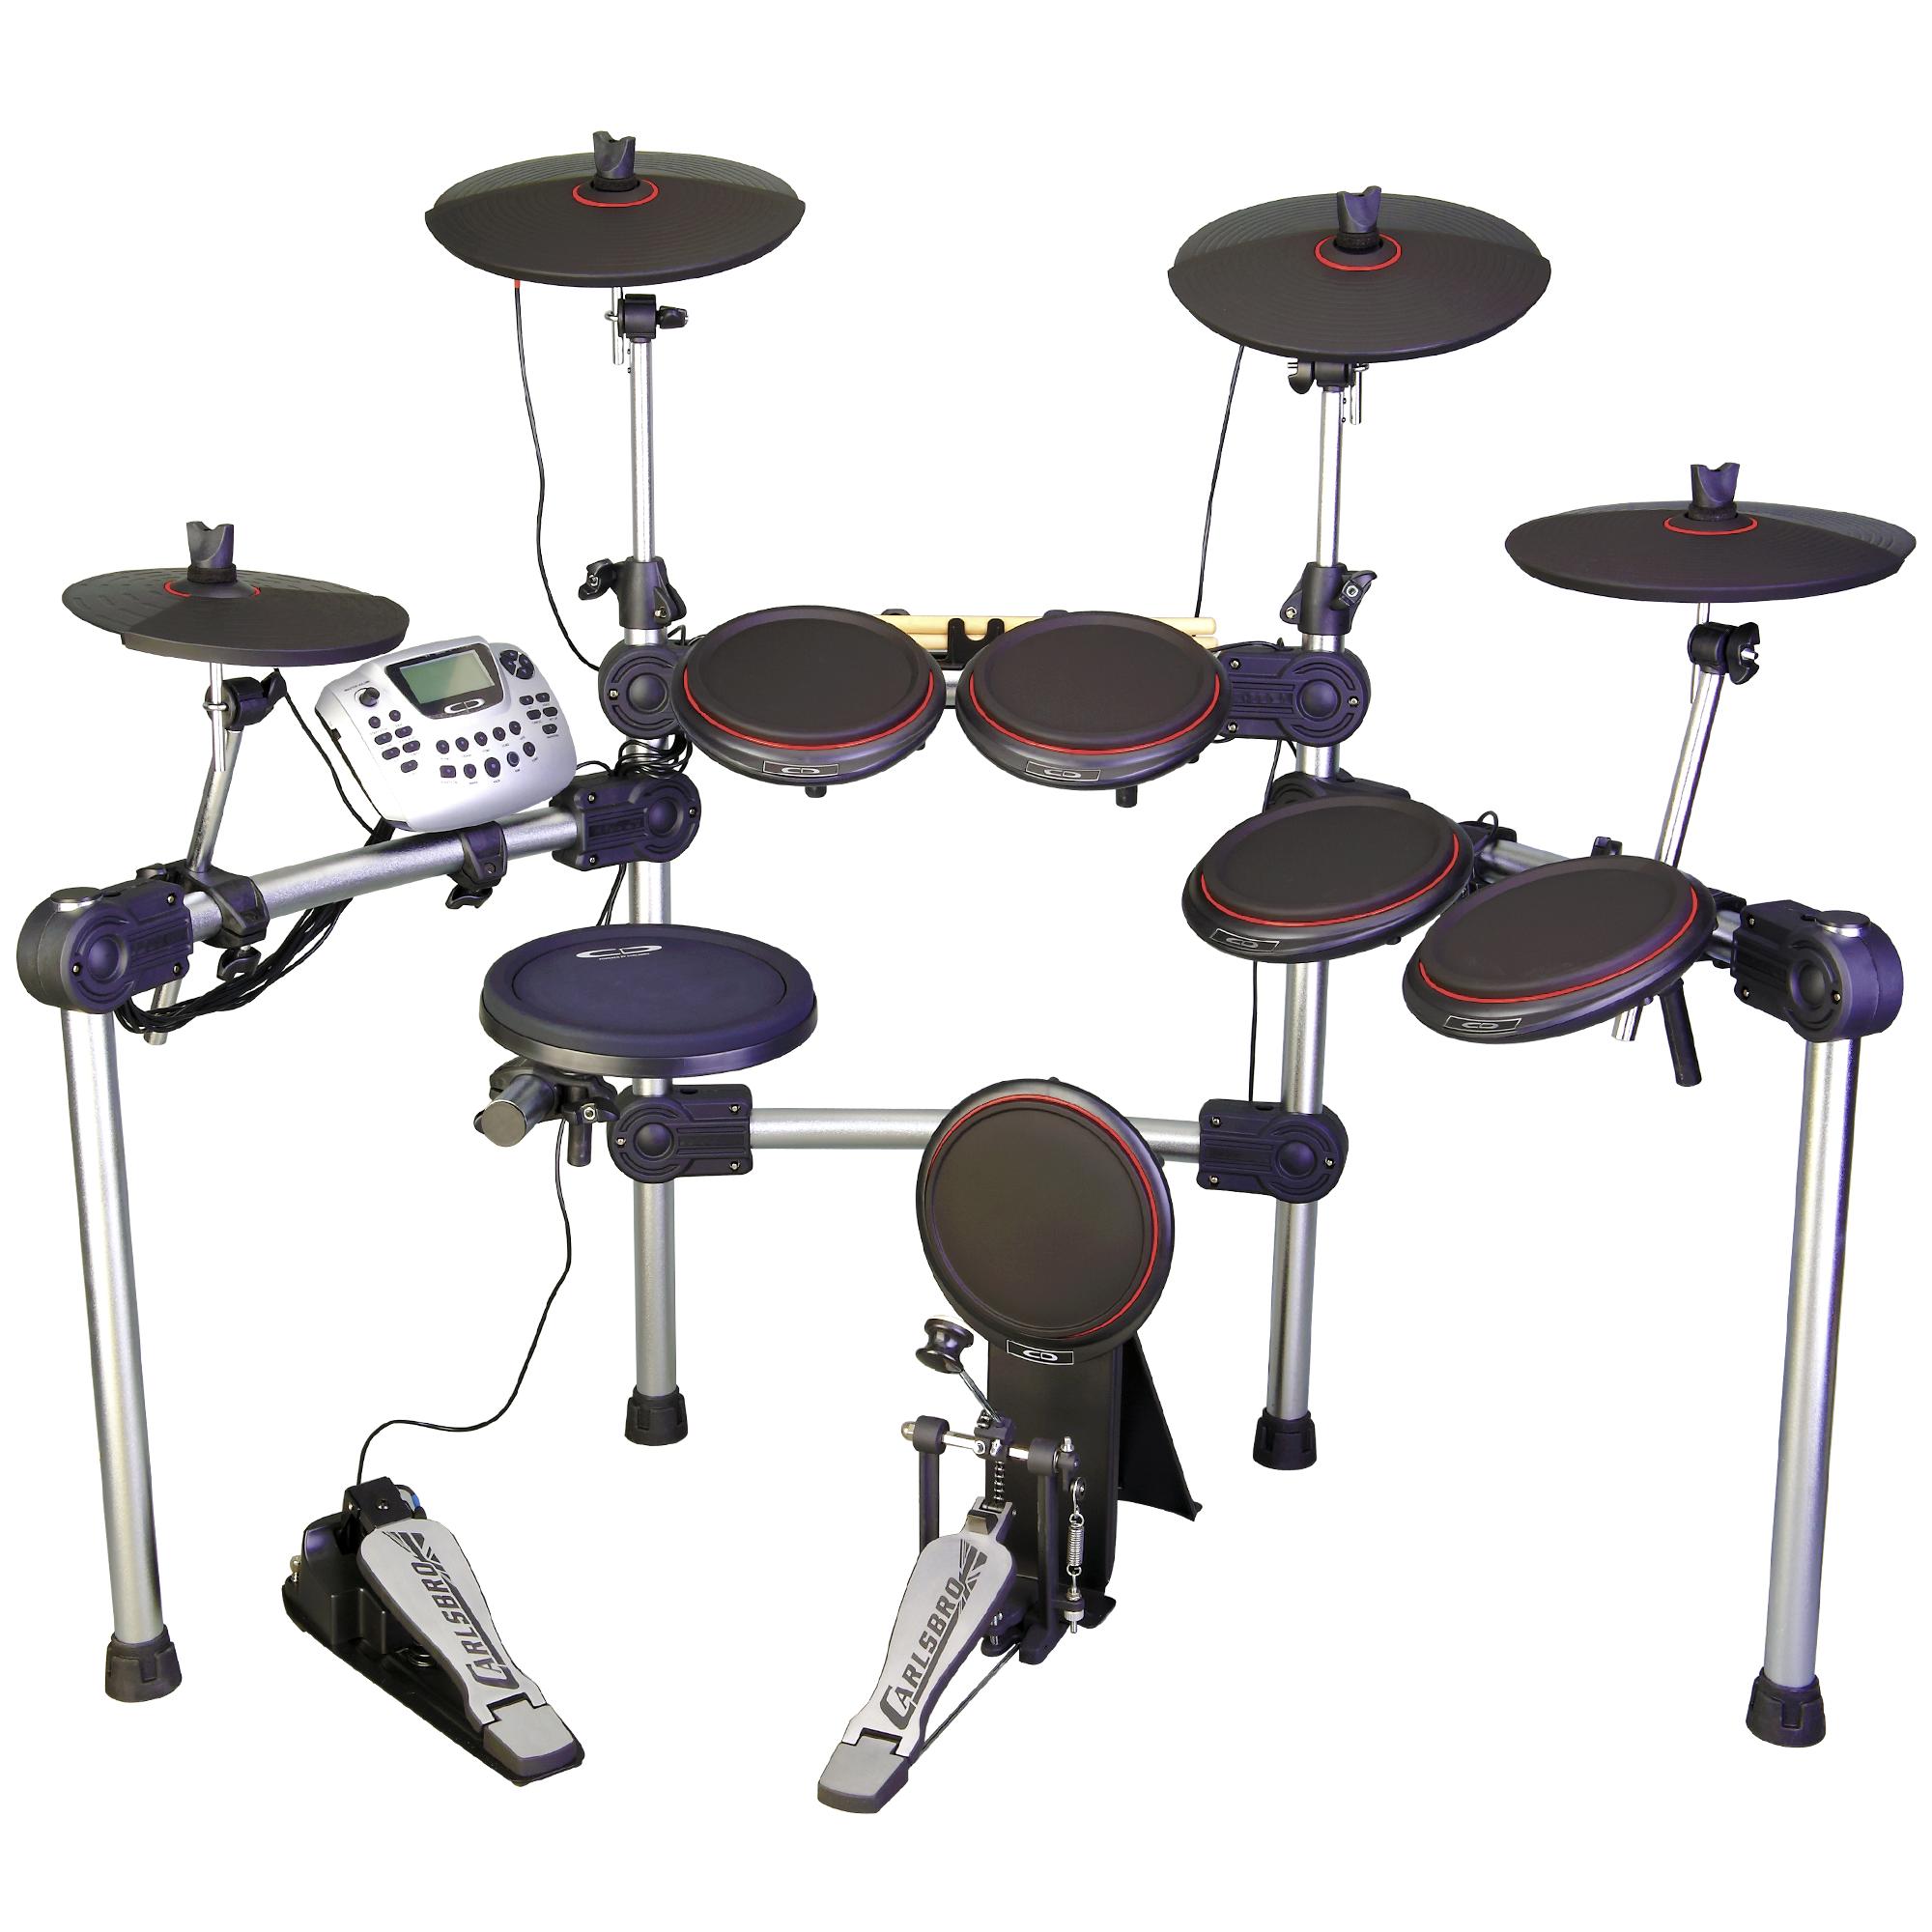 CARLSBRO CSD230 10 Piece Electronic Drum Kit